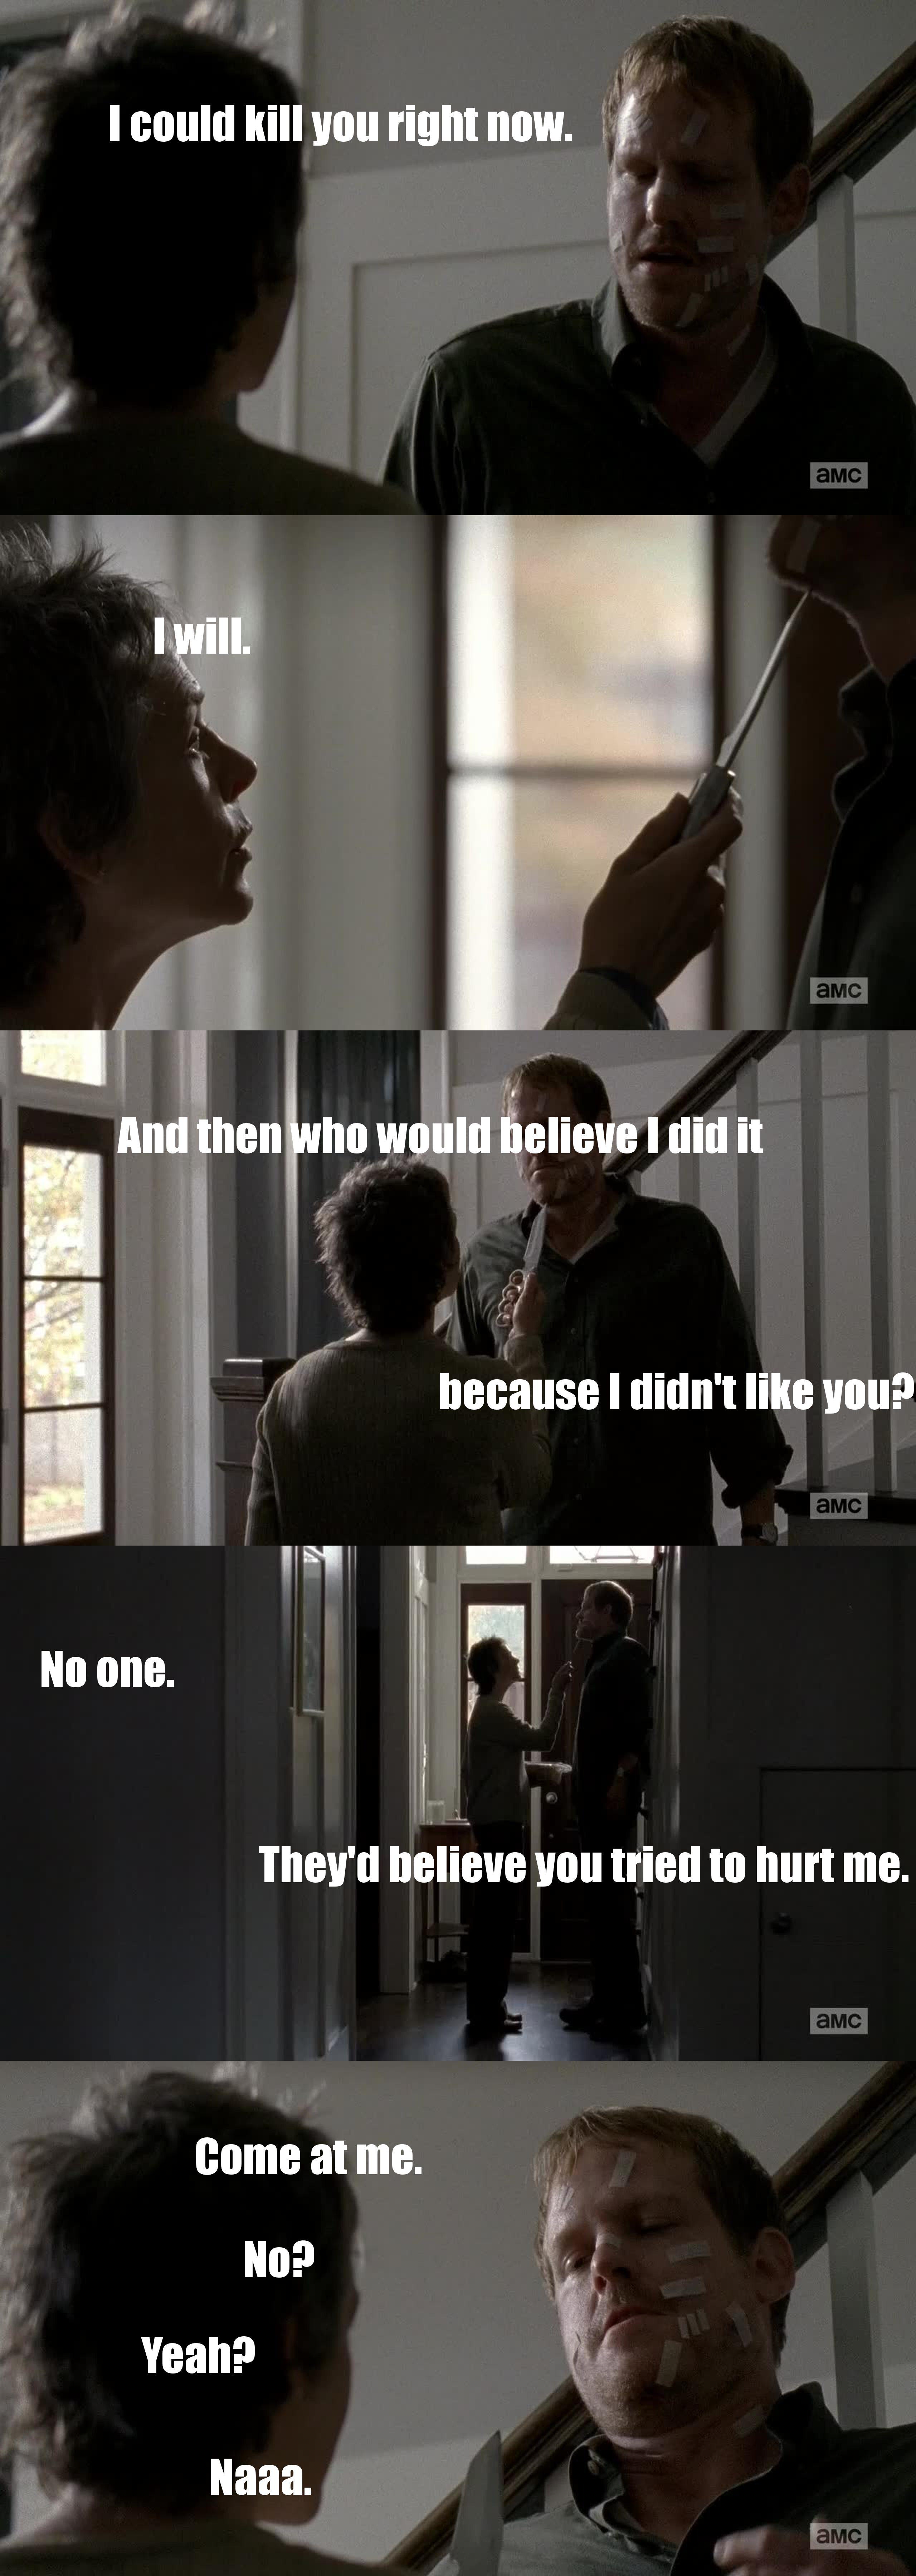 the badass Carol is very intimidating!